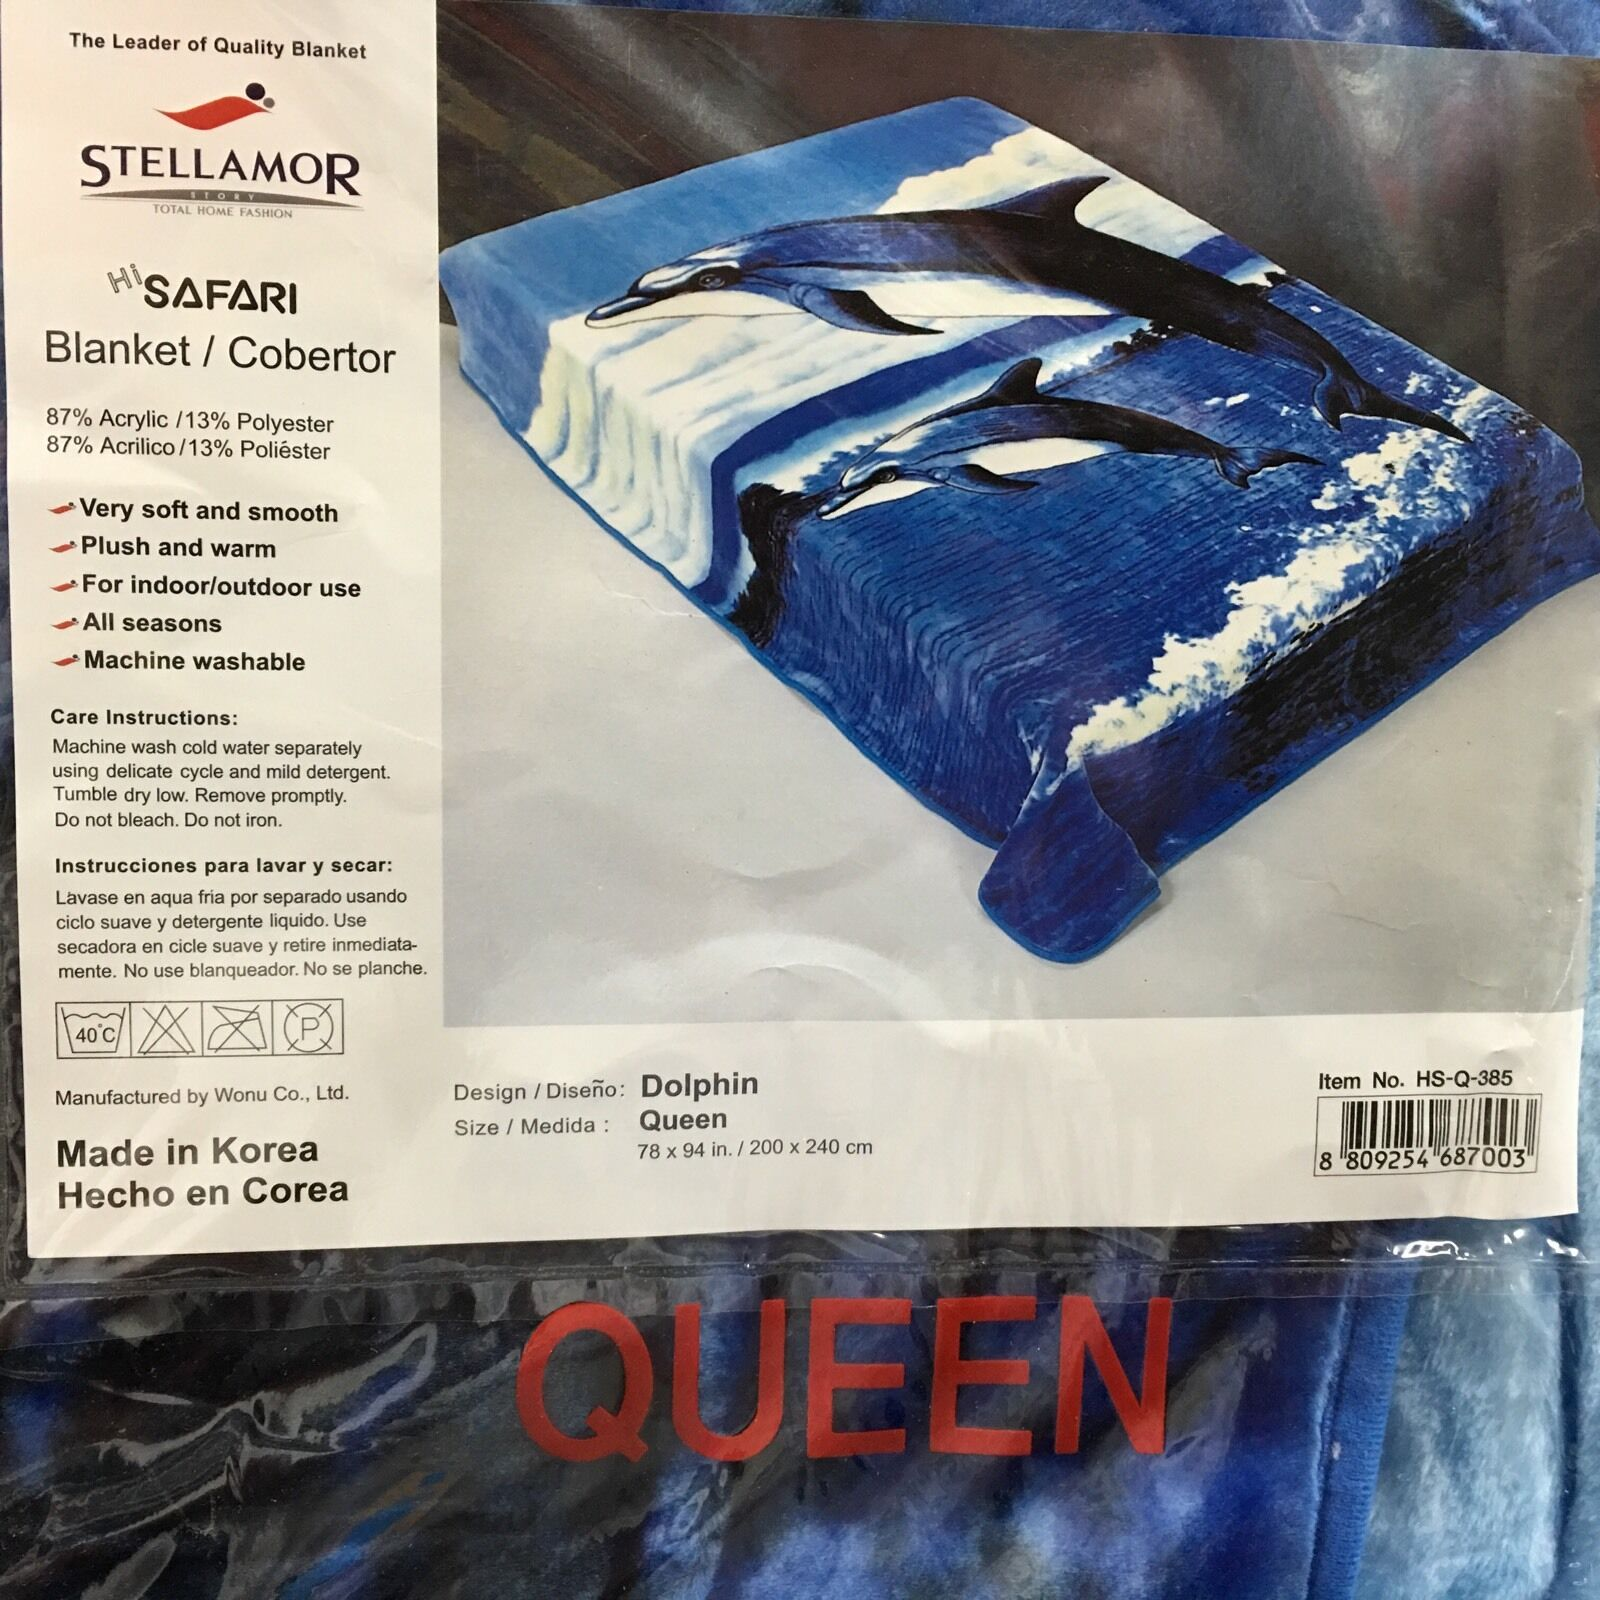 Wonu Hi-Safari Stellamor Original Acrylic Queen Größe Korean Dolphin Blanket